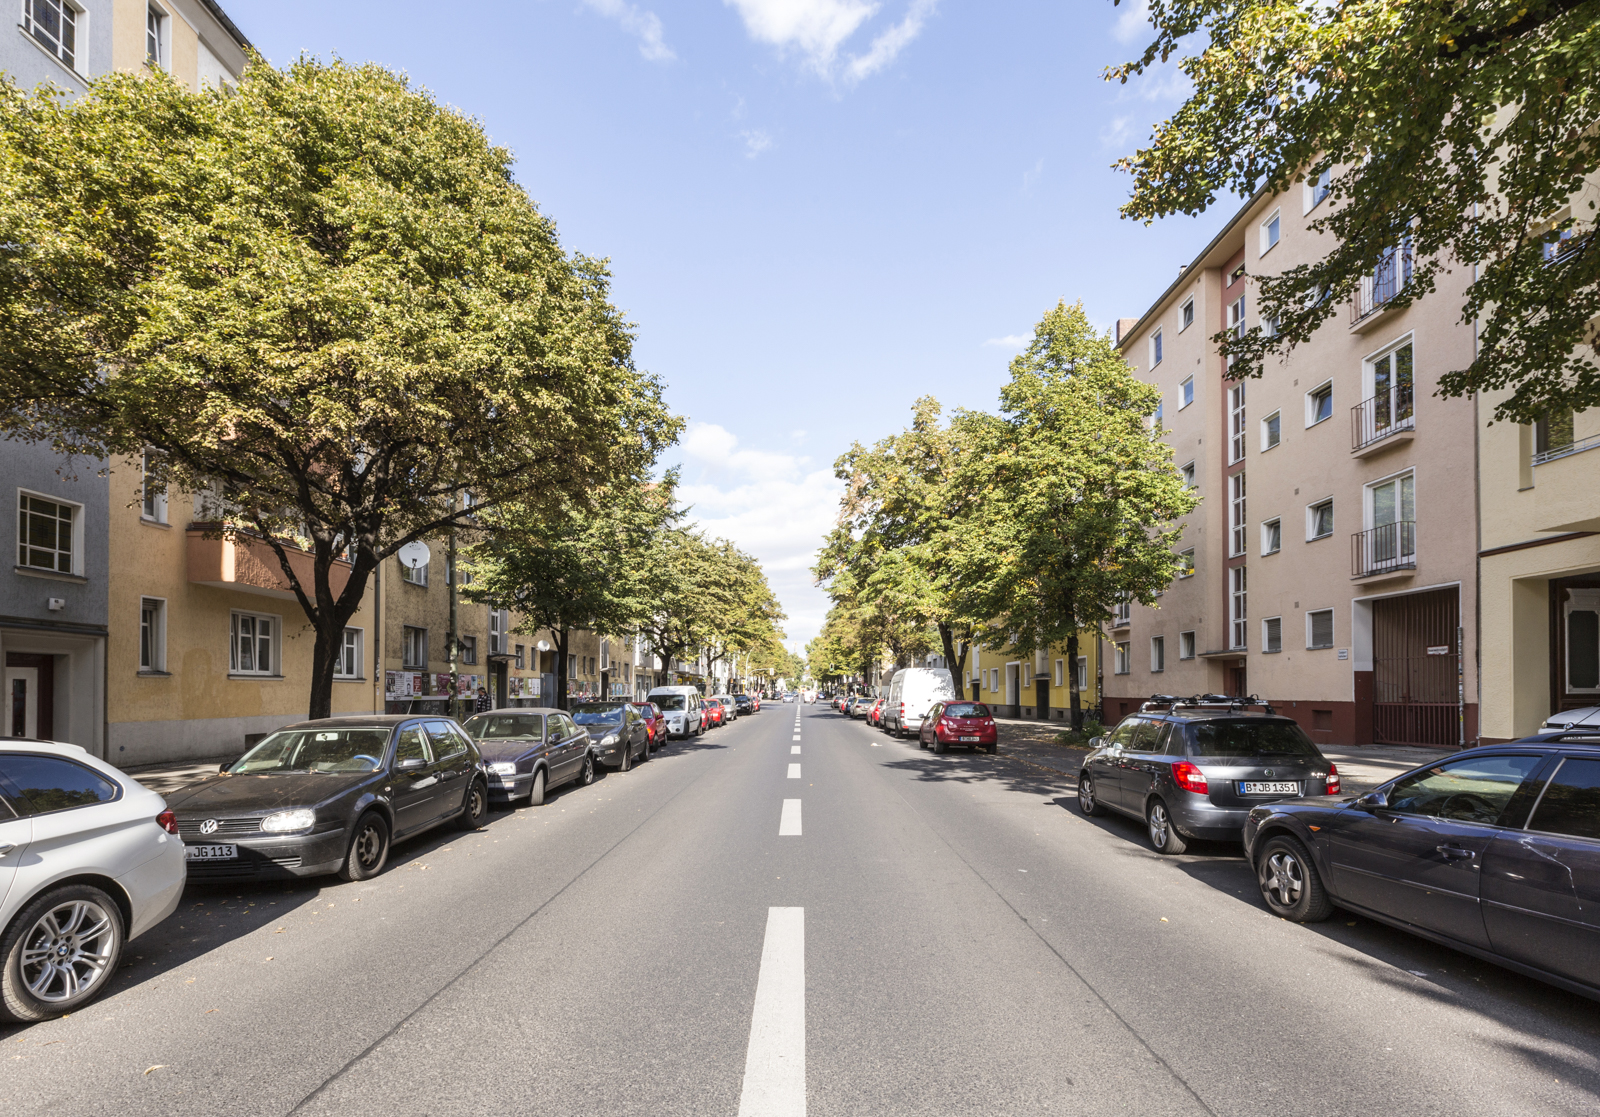 Ingo_Lawaczeck_Mähren_Pannierstraße-1